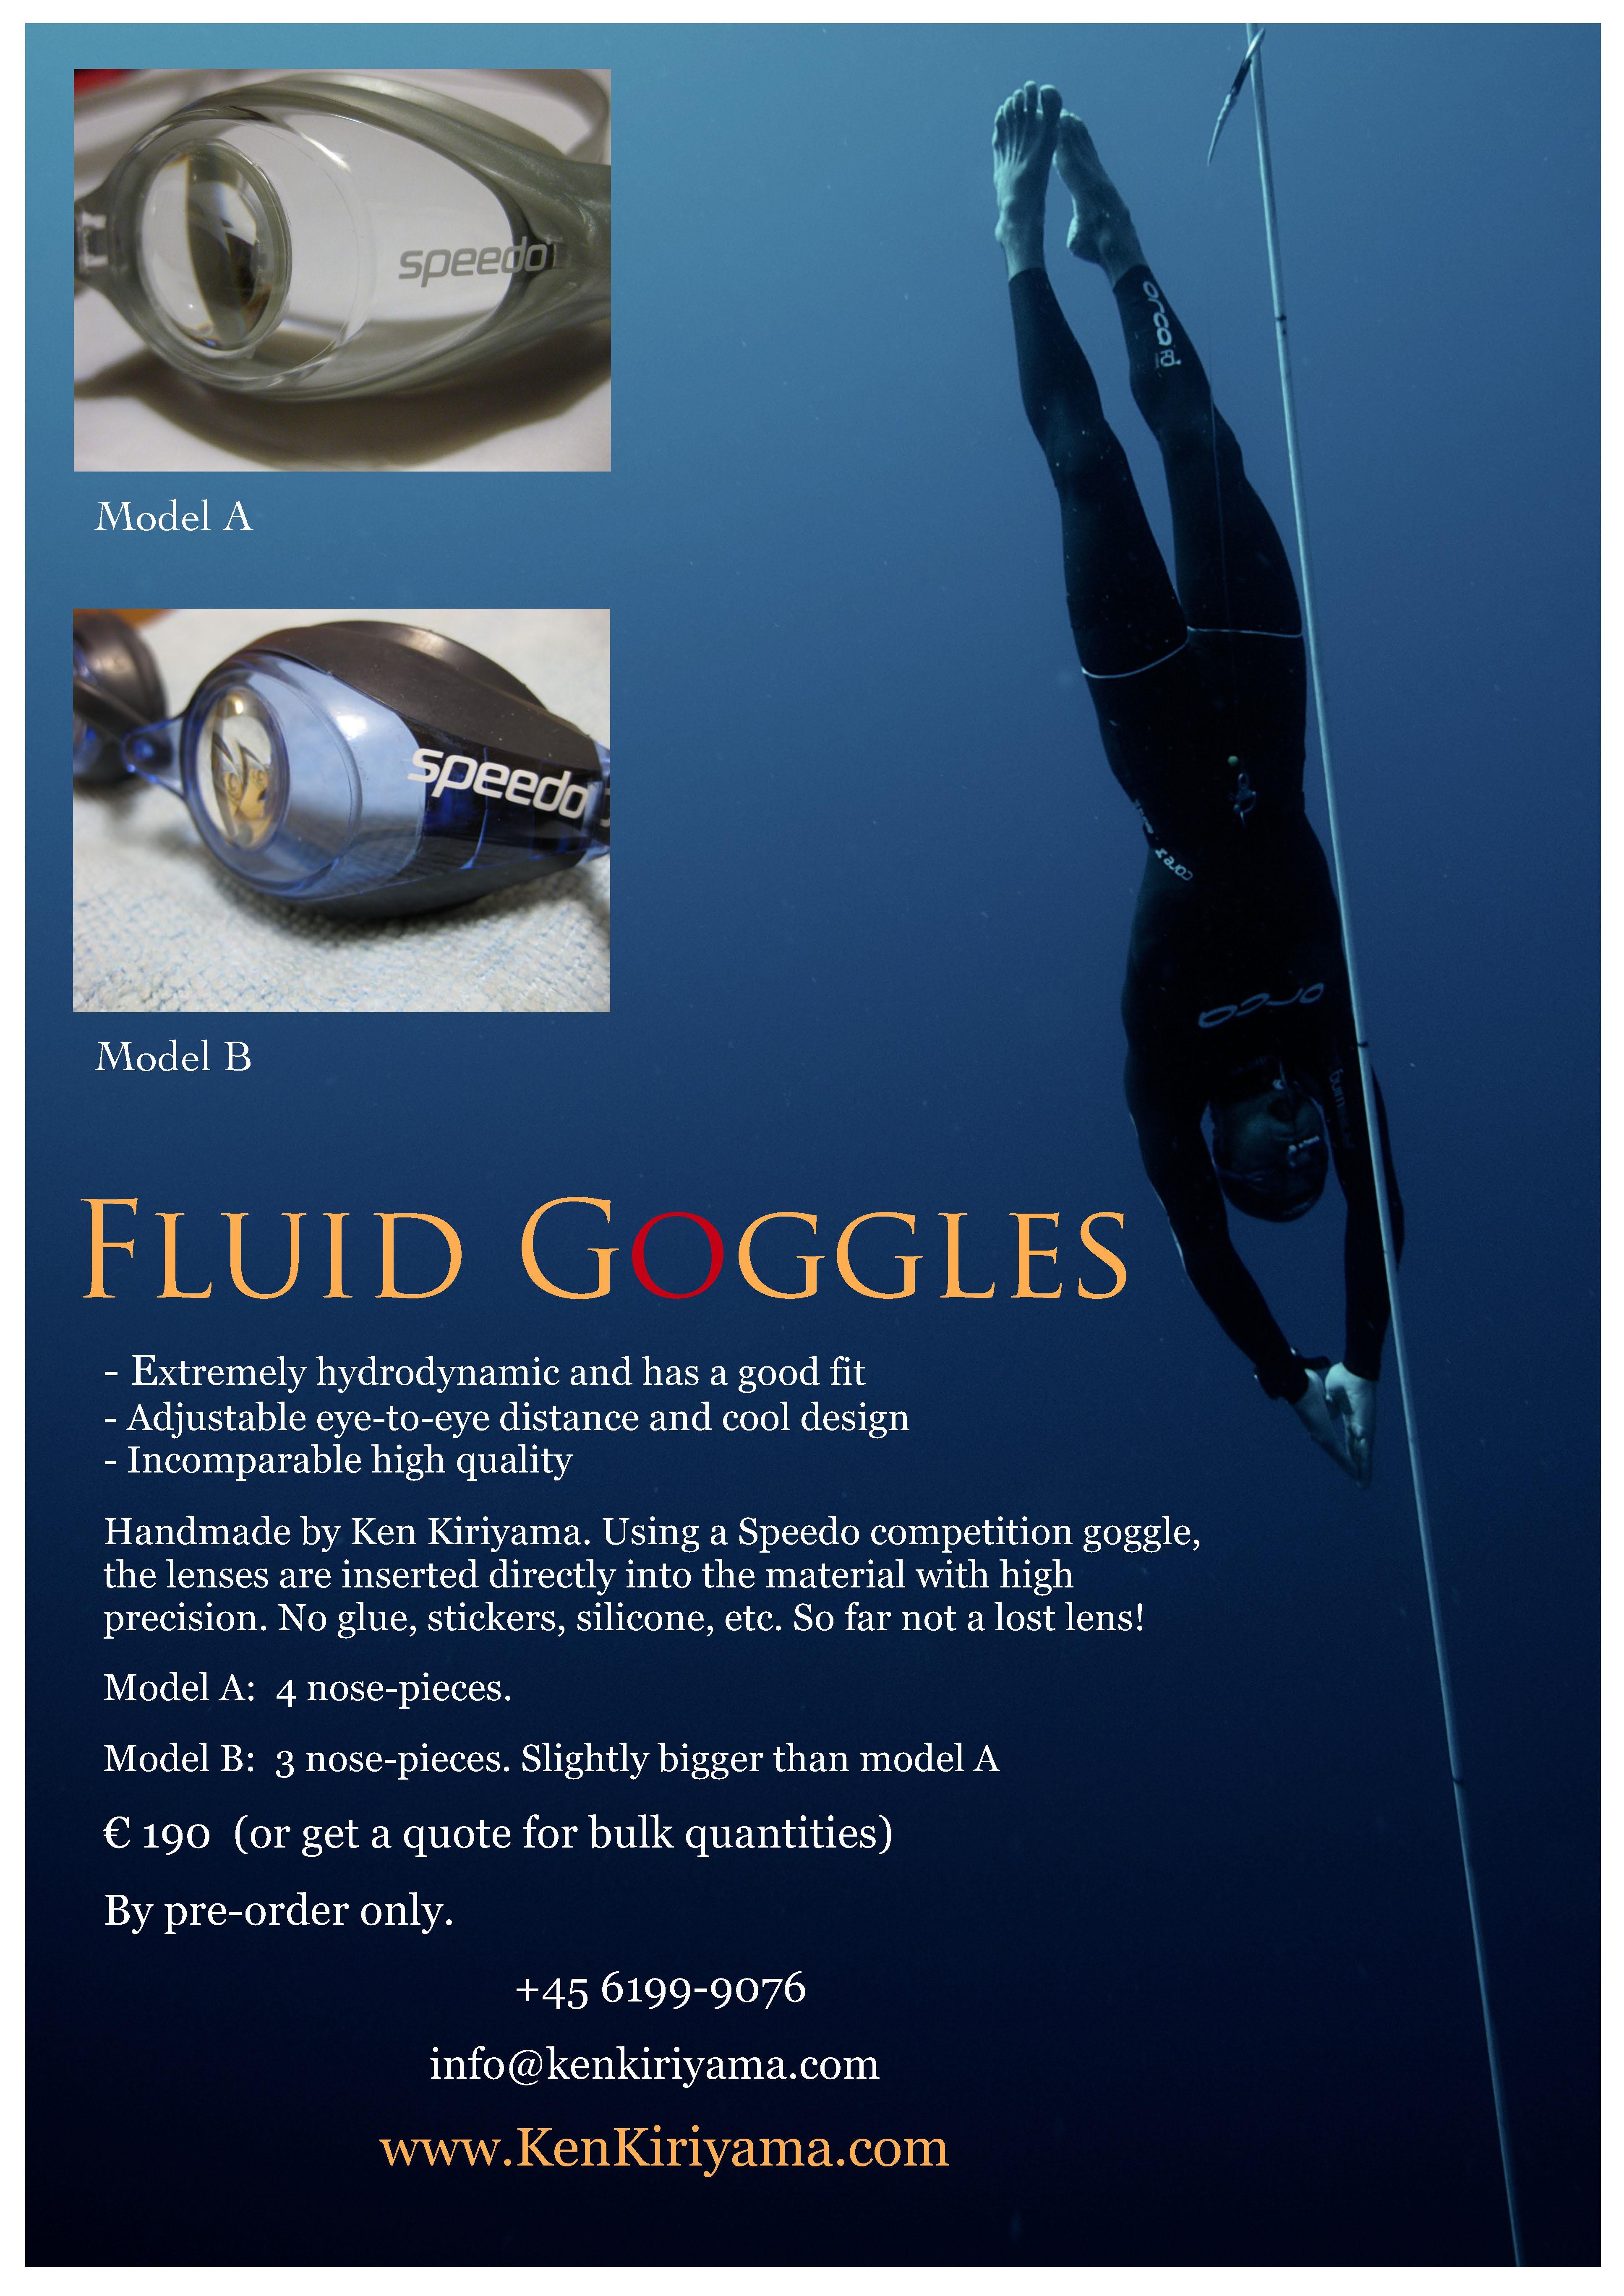 Fluid goggles 2013